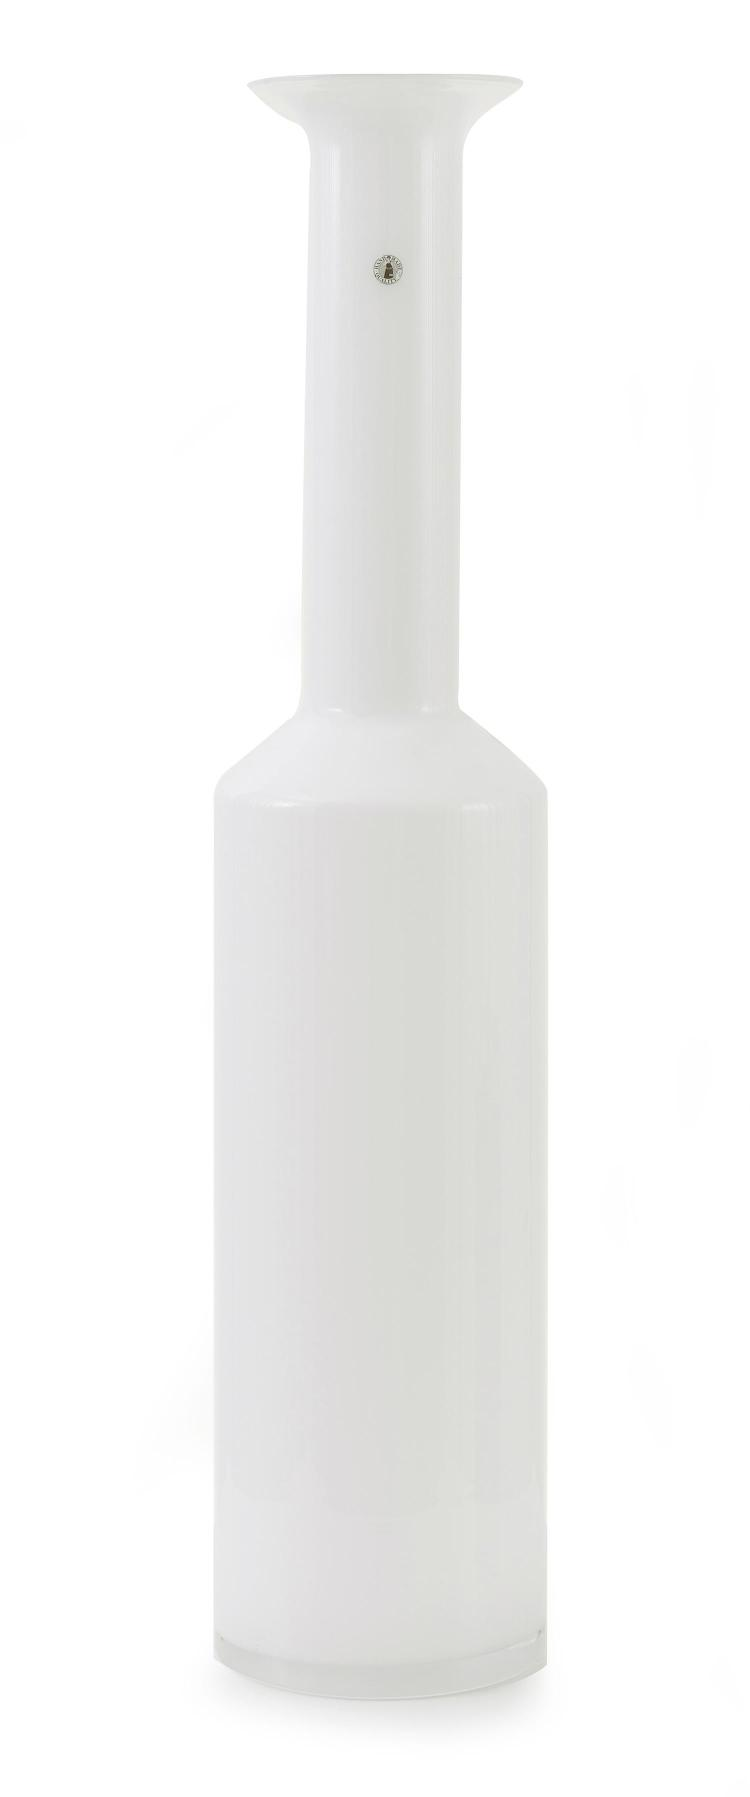 Large Glass Vessel : Lot 277: LARGE WHITE GLASS VESSEL